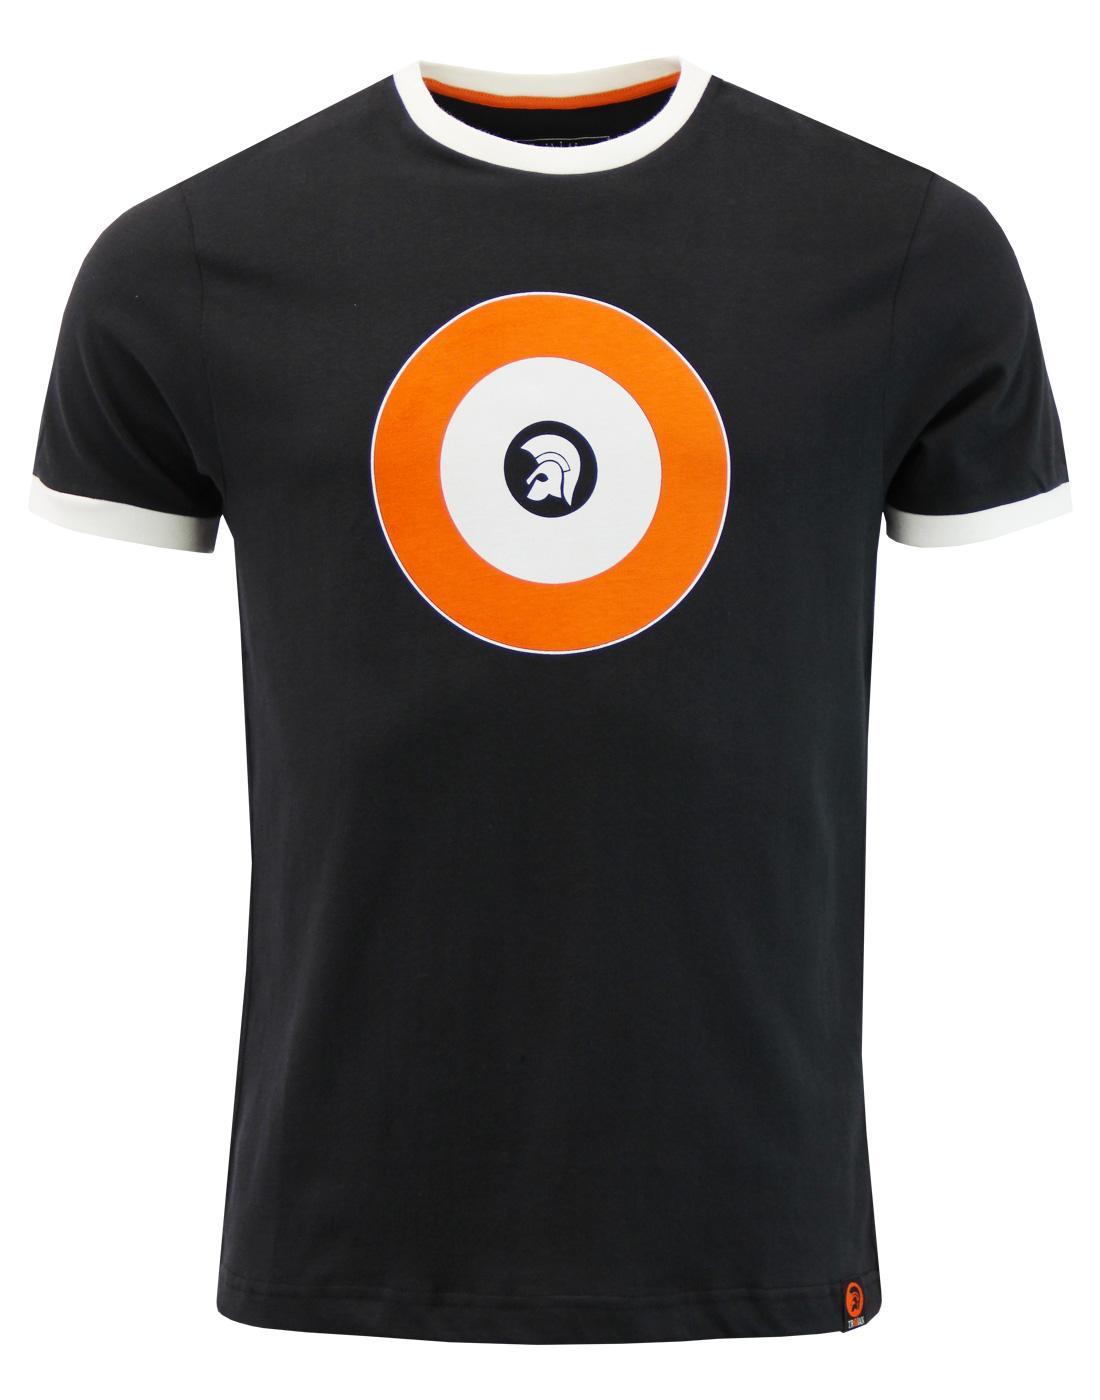 TROJAN RECORDS Helmet Logo Mod Target T-Shirt (B)